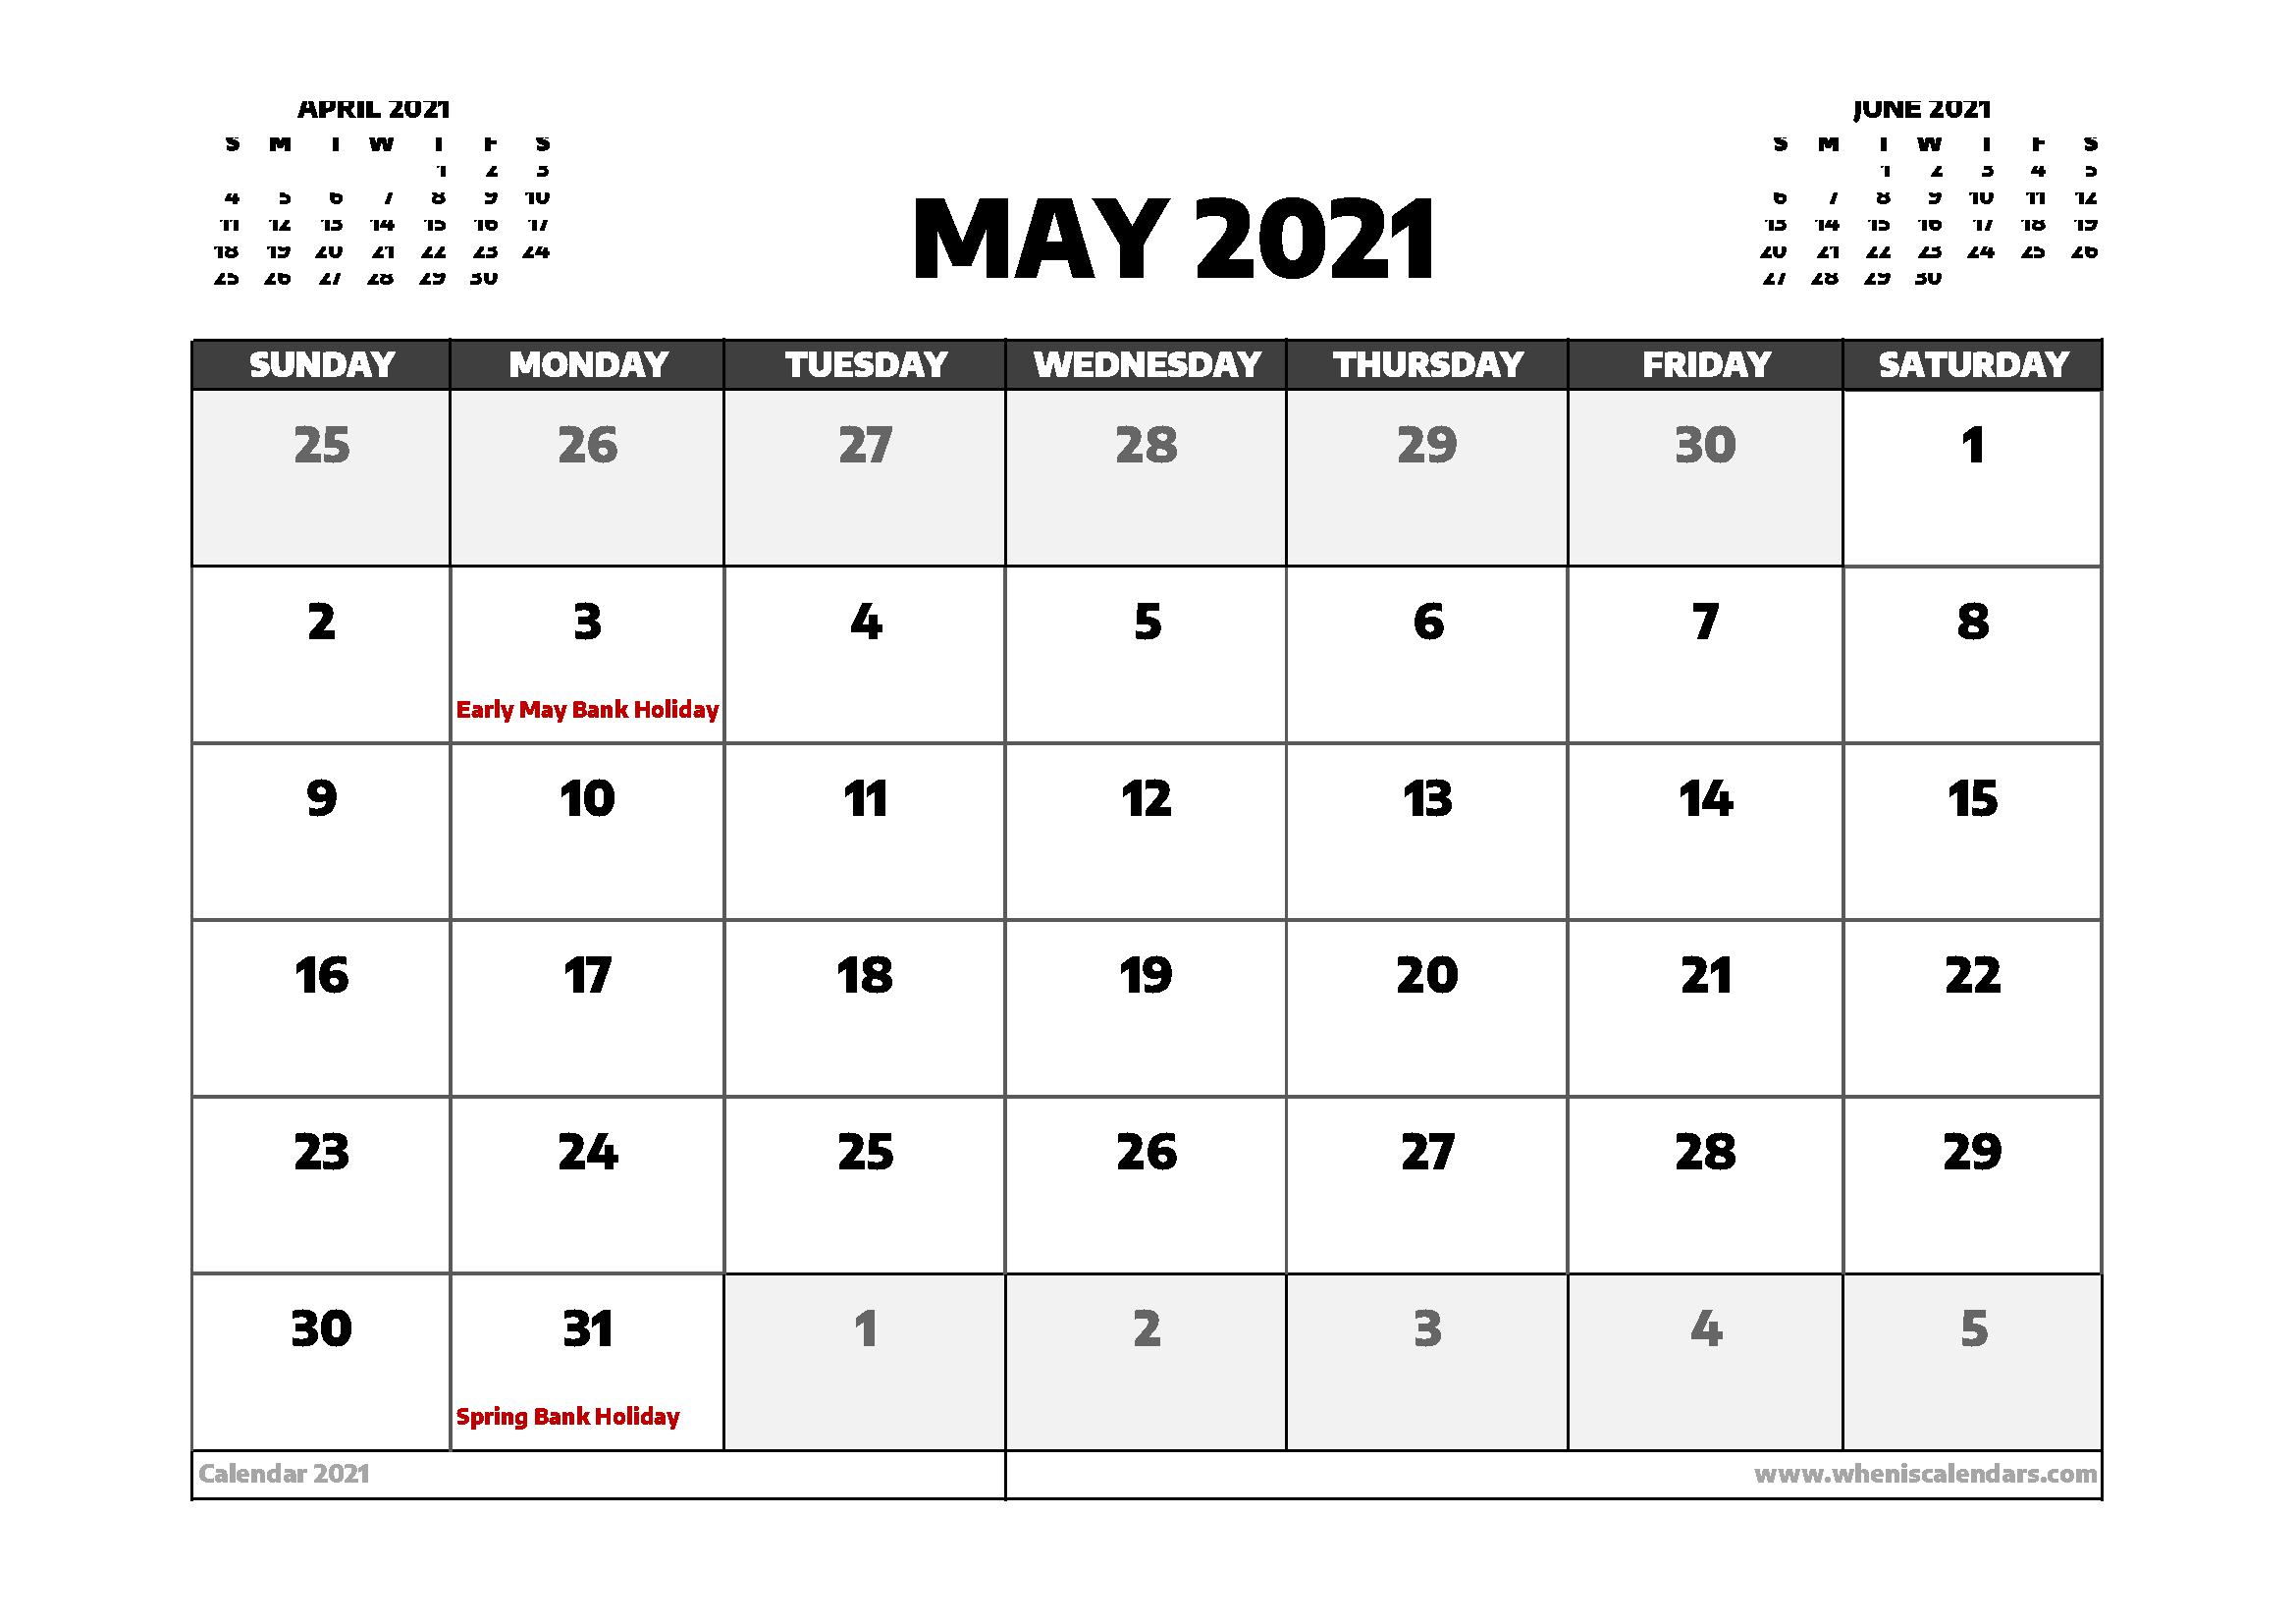 May Calendar 2021 Uk - April 2021